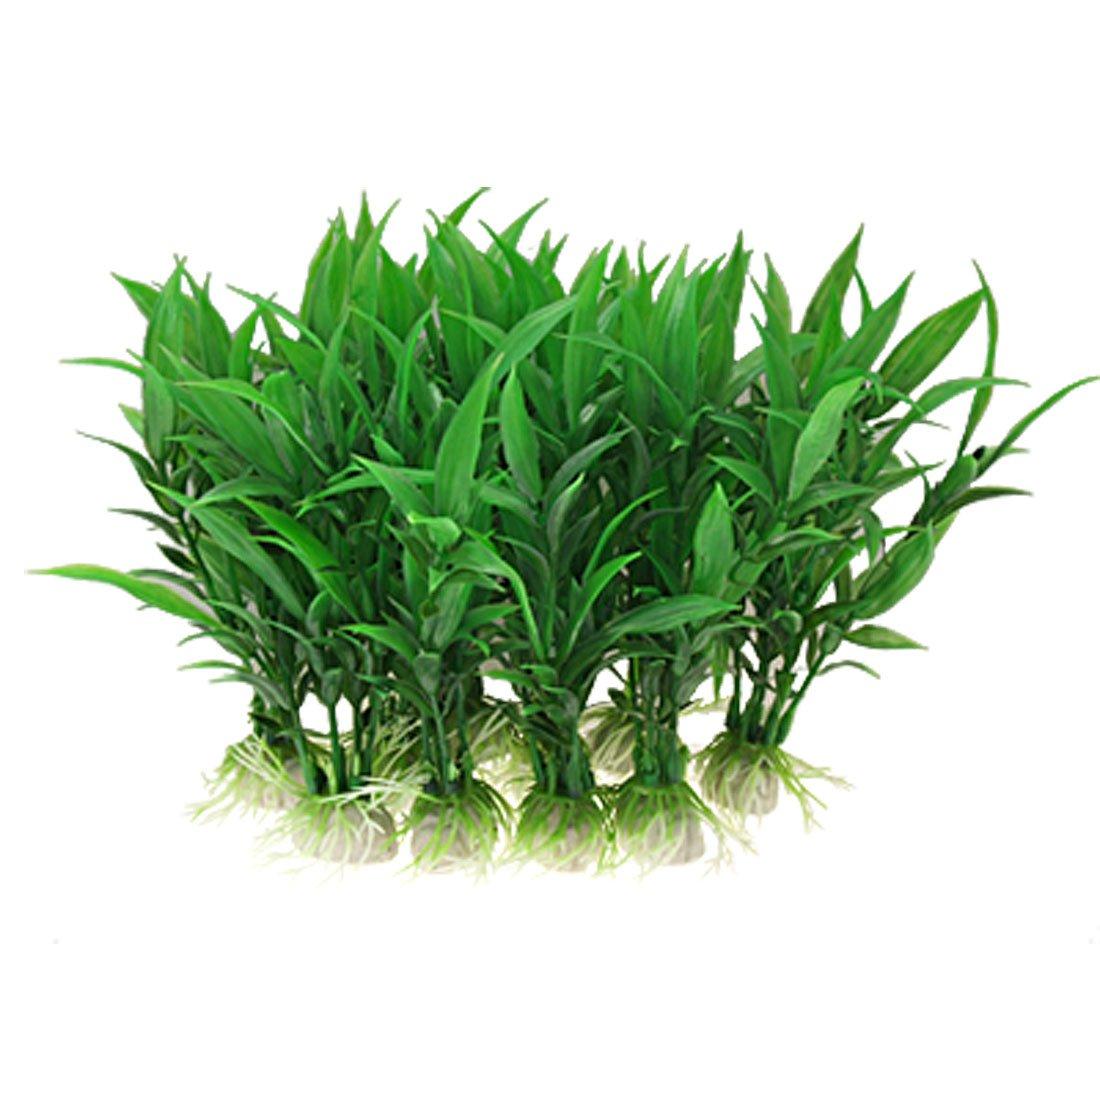 Jardin Plastic Aquarium Tank Plants Grass Decoration, 10-Piece, Green